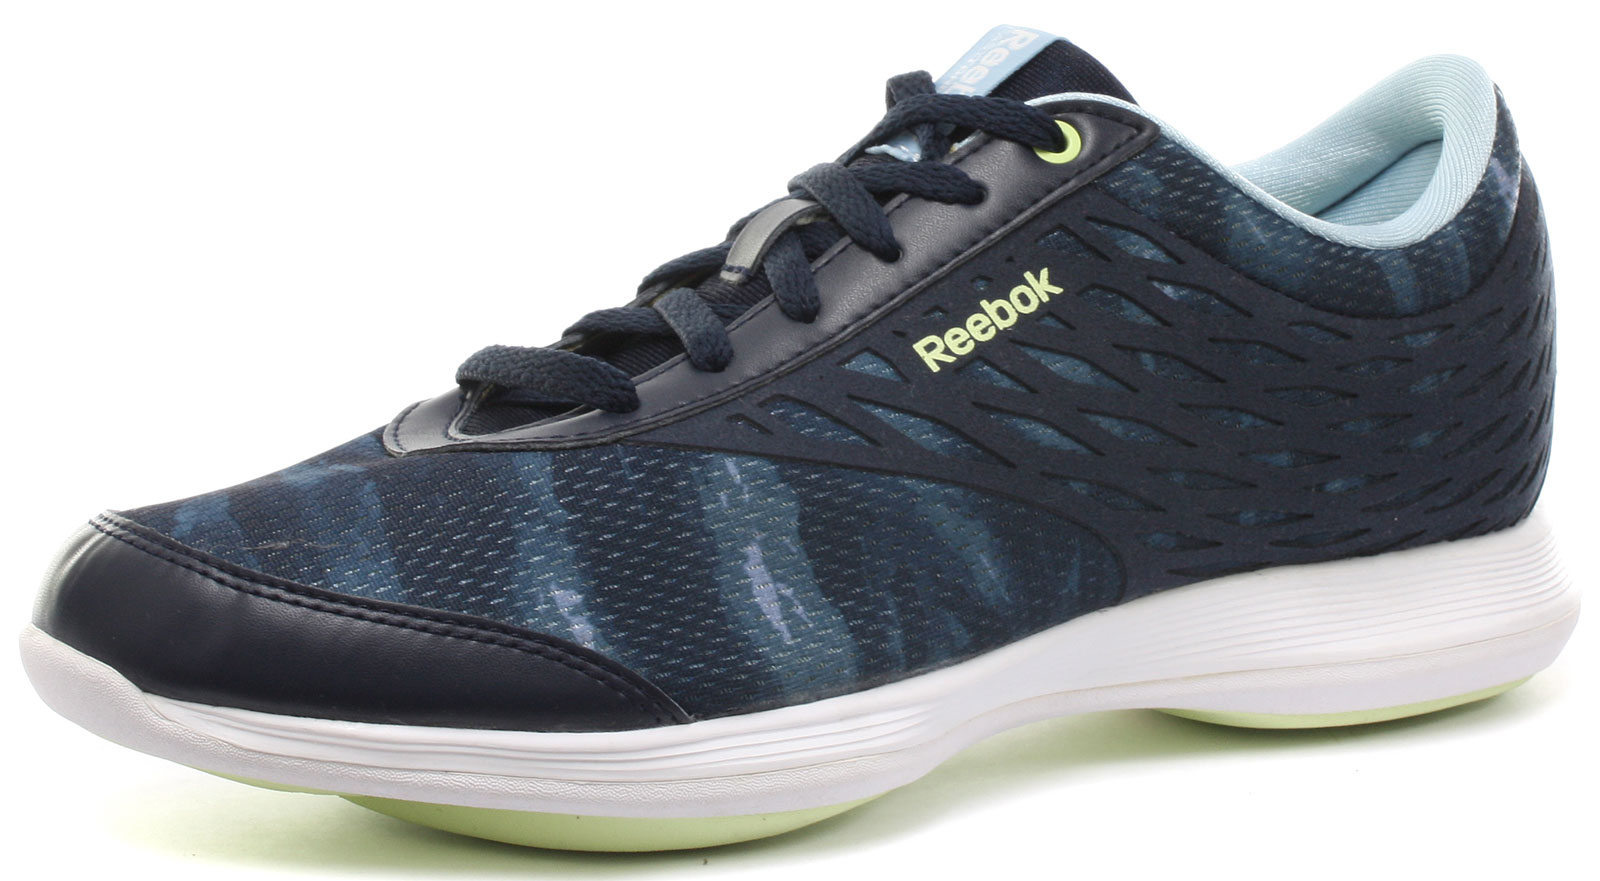 9ea5bdbb22b77 Acquista scarpe da ginnastica reebok easytone - OFF57% sconti